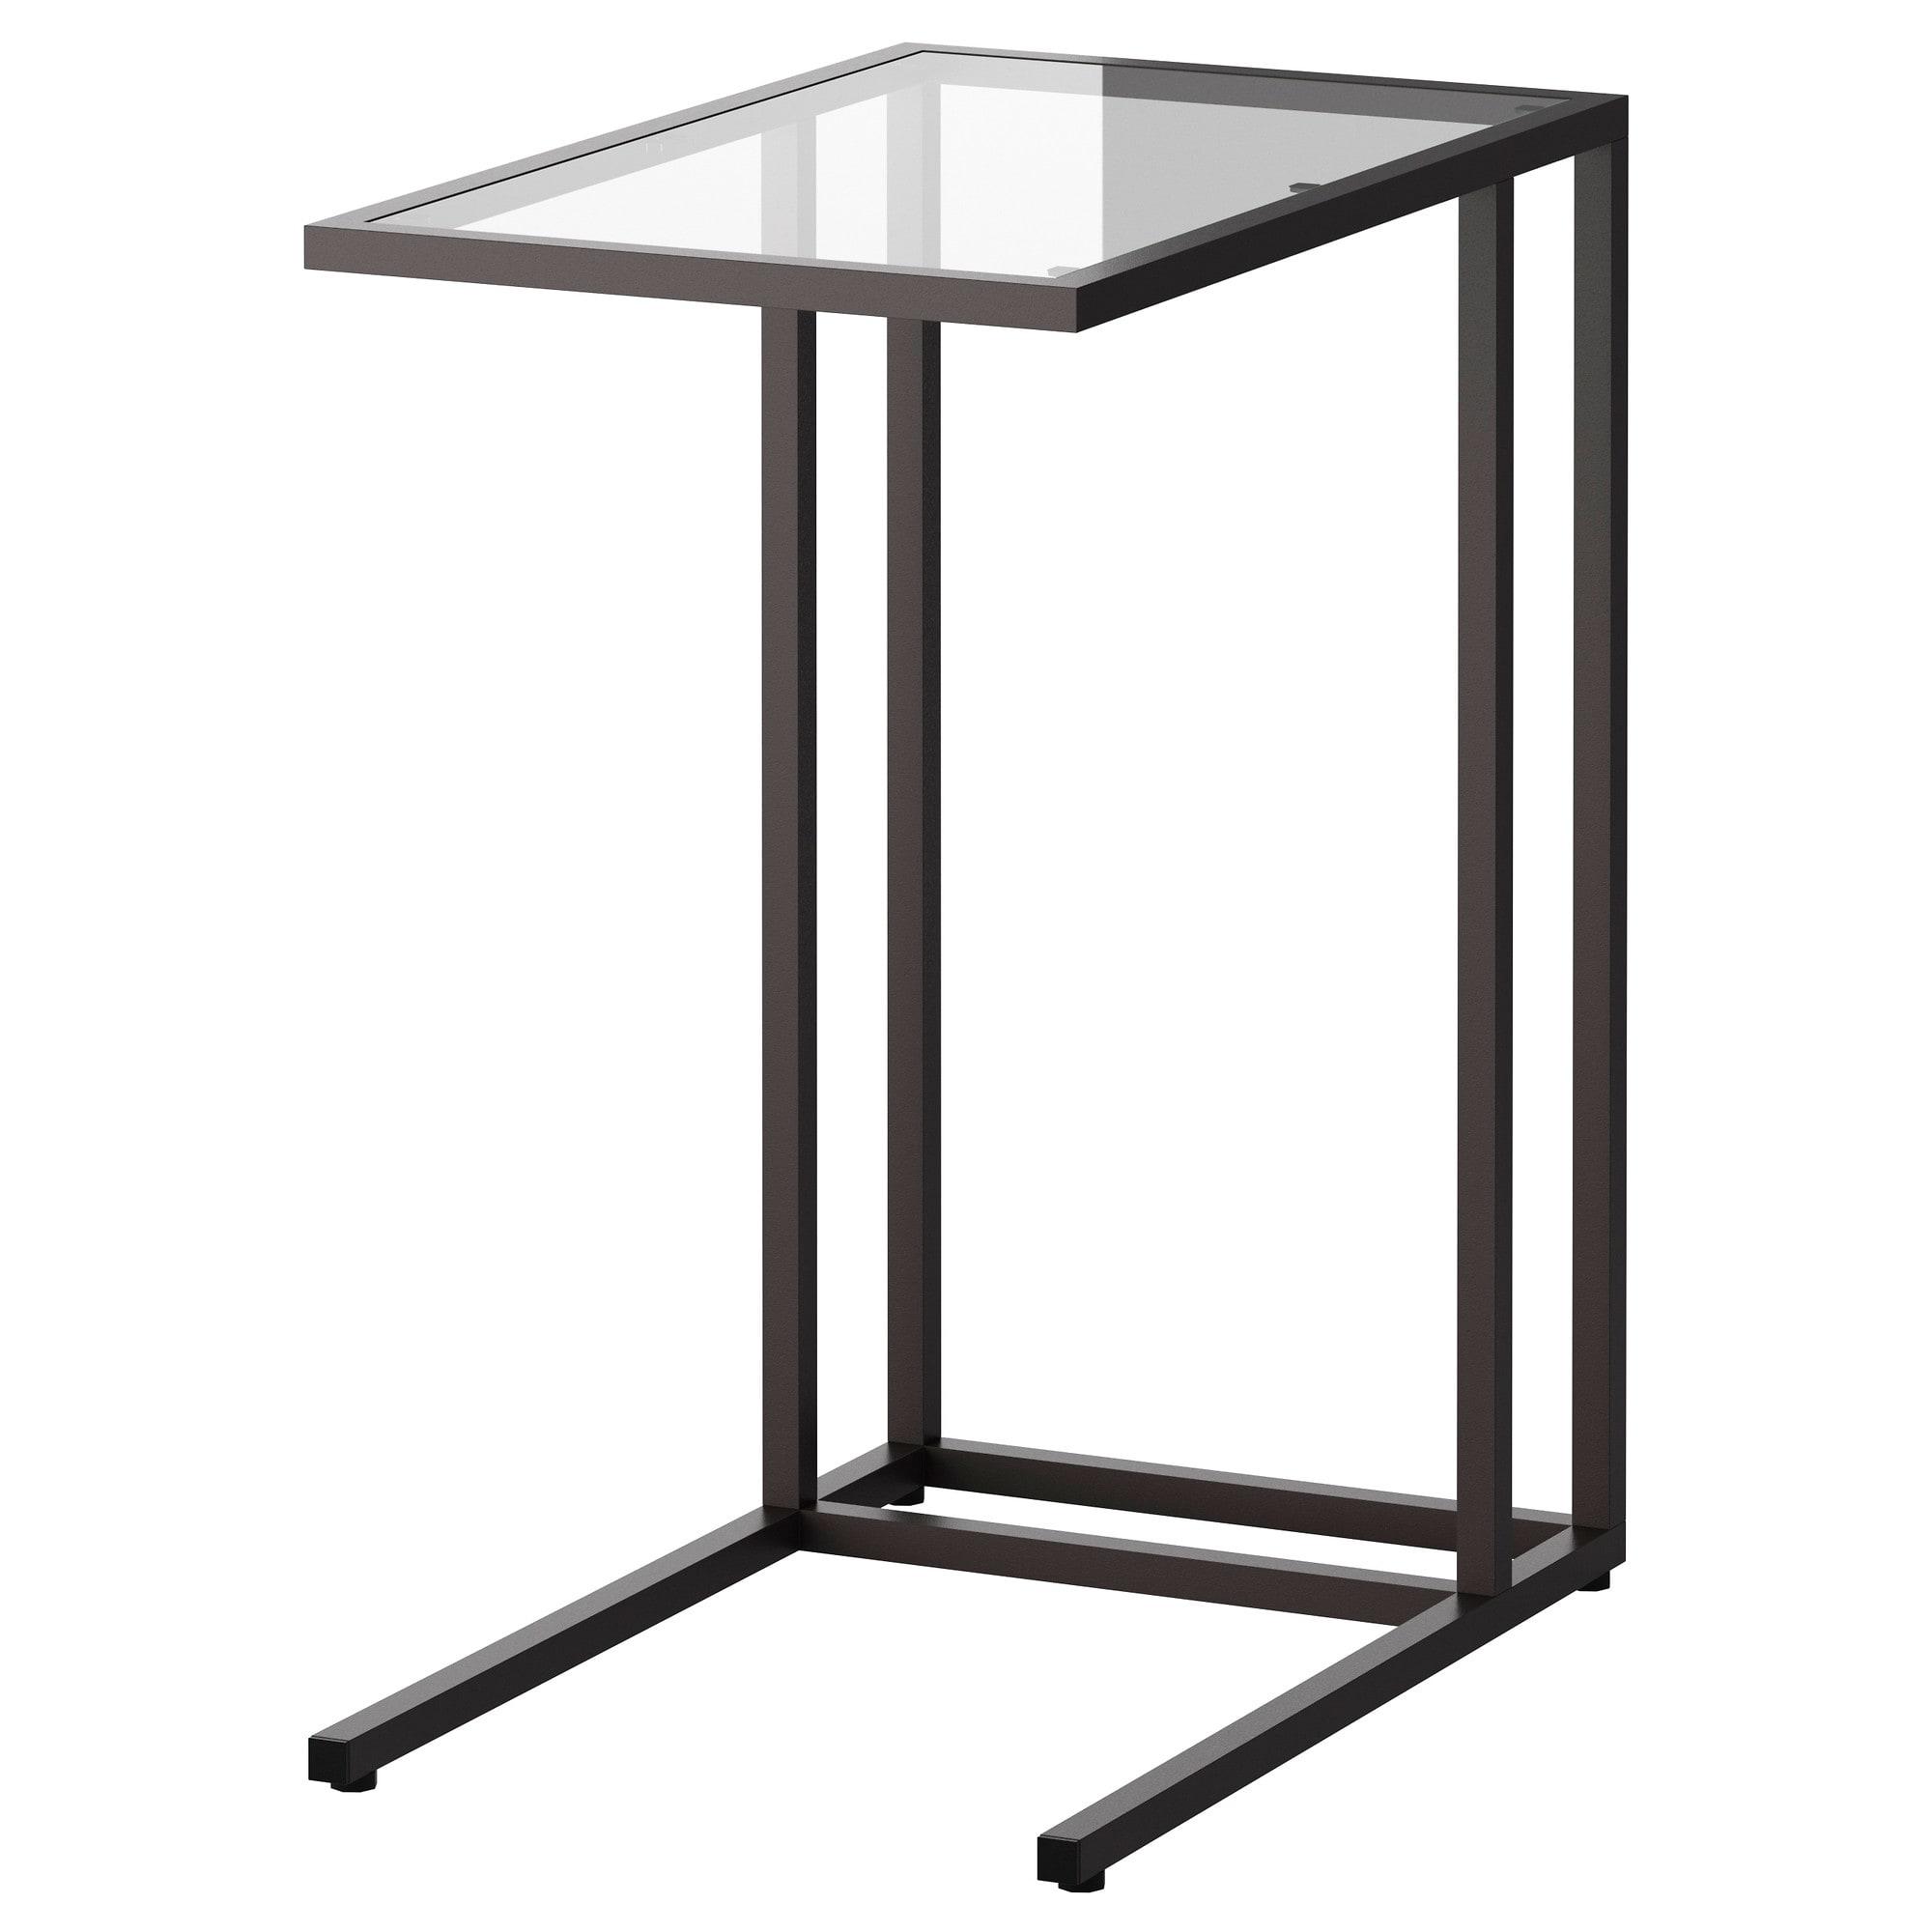 Vittsjo Laptop Stand Black Brown Glass 13 3 4x25 5 8 Ikea Laptop Stand Ikea Ikea Laptop Stand [ 2000 x 2000 Pixel ]